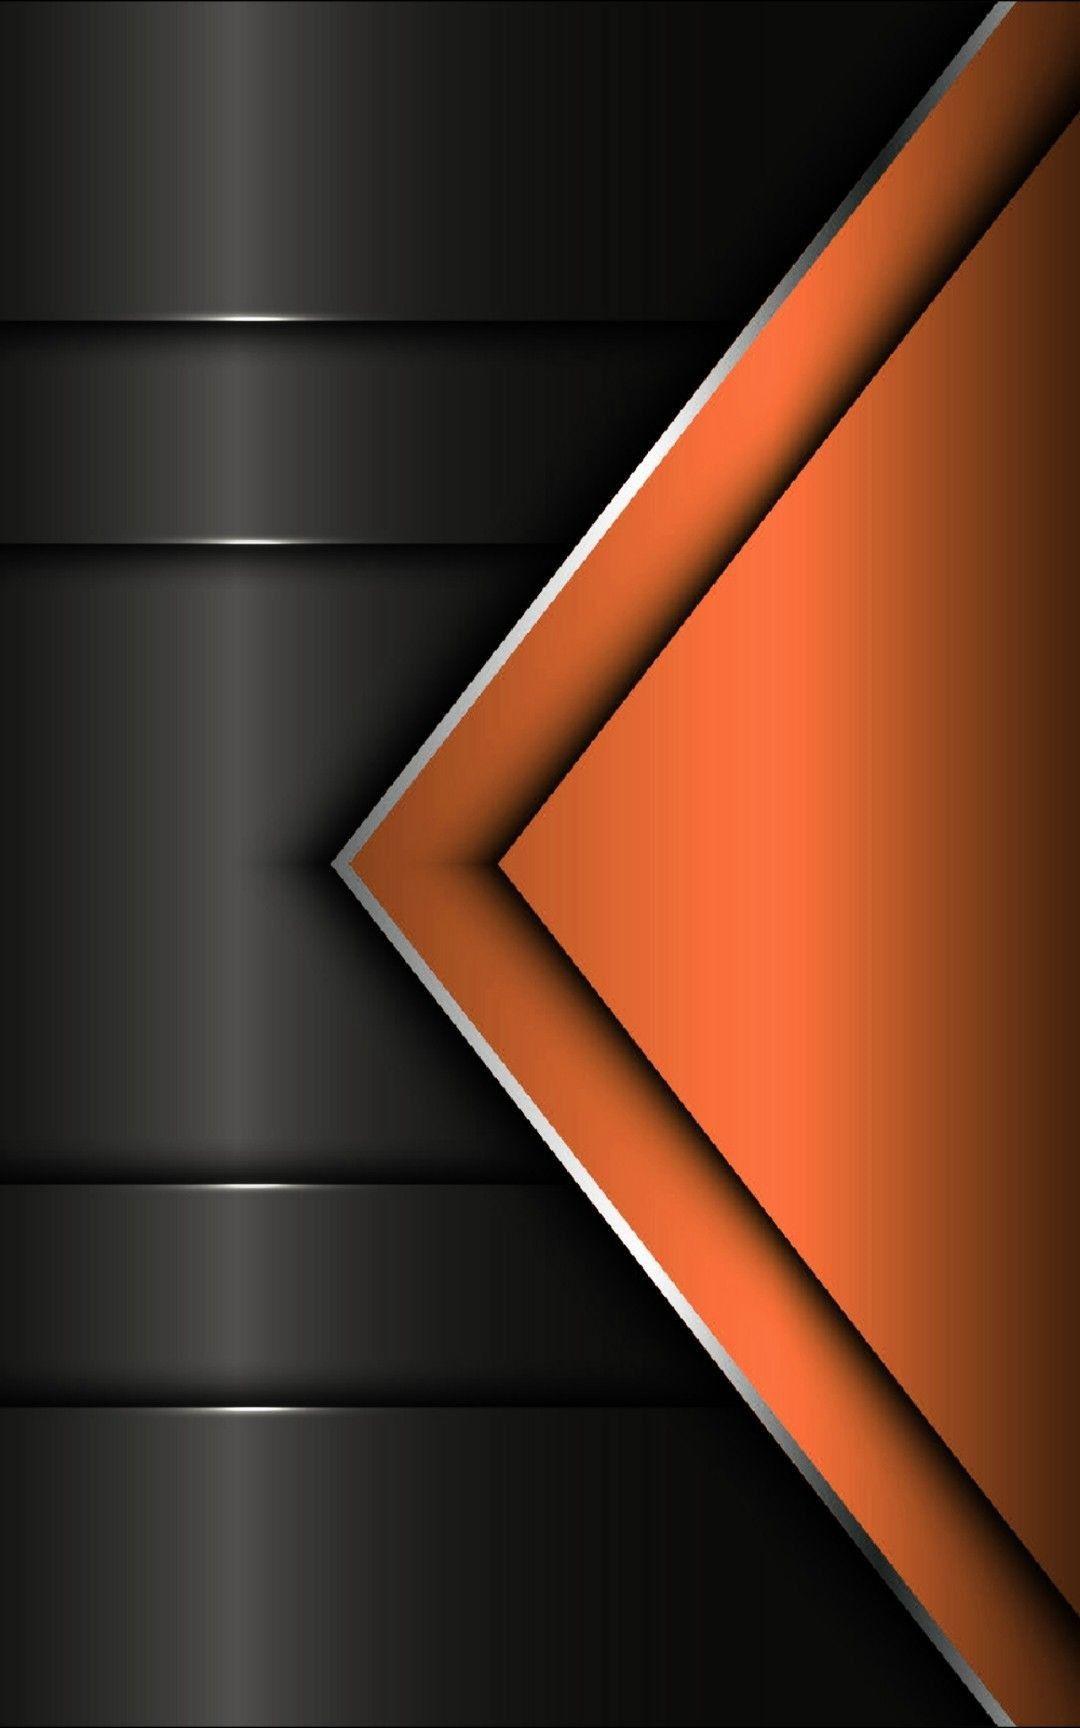 Epingle Par Carlos Calderon Sur Metal Backgrounds Ecran Iphone Fond Ecran Iphone